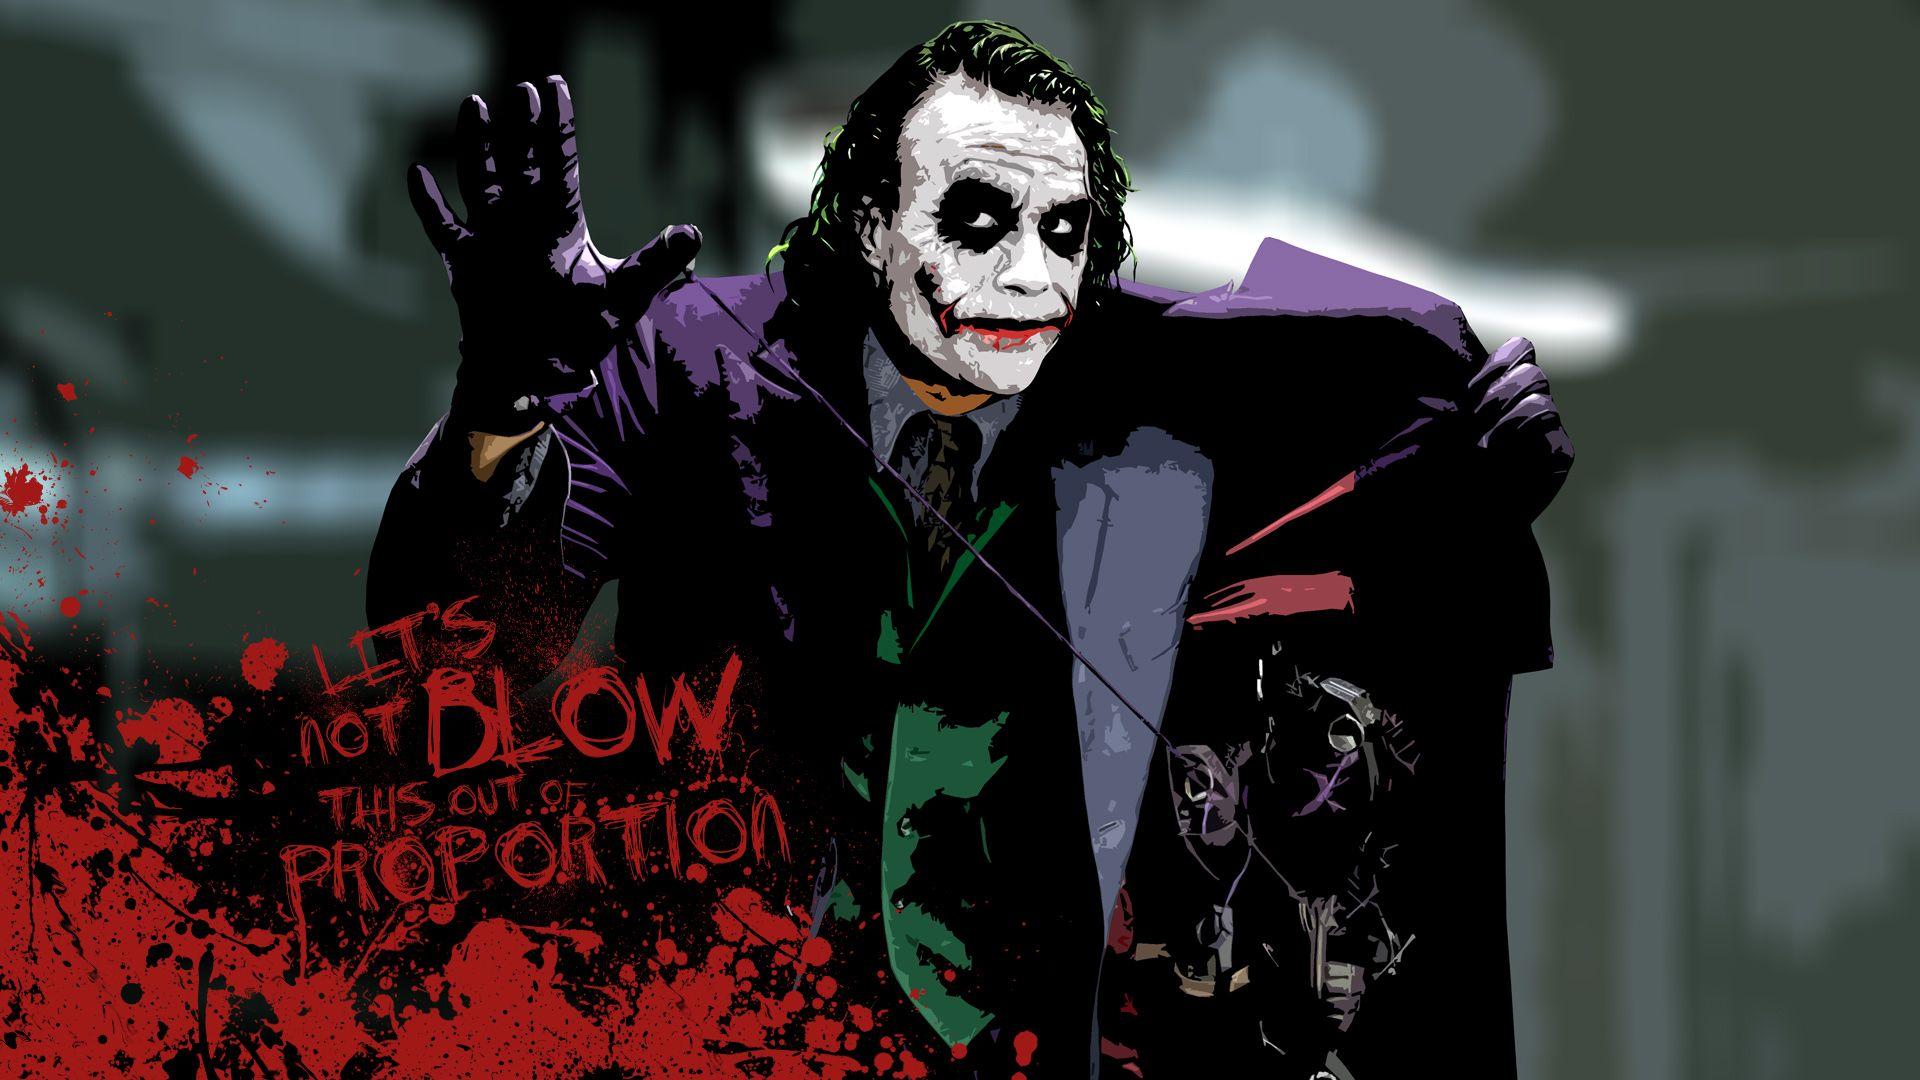 Out Of Proportion Joker Wallpapers Batman Joker Wallpaper Joker Hd Wallpaper Dark knight horror joker wallpaper hd